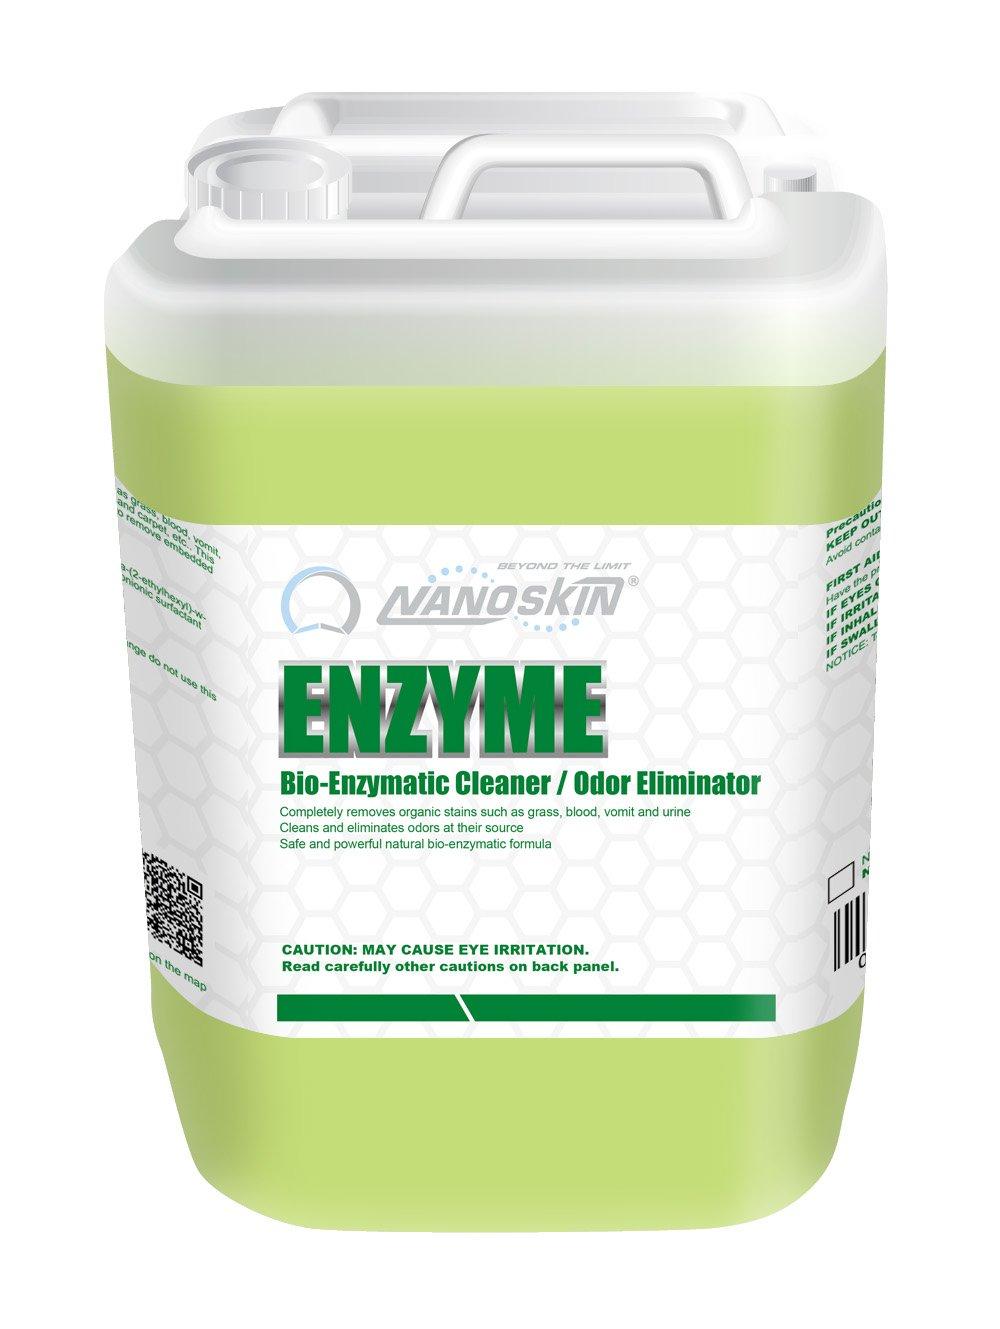 Nanoskin NA-EZM640 Enzyme Bio-Enzymatic Cleaner/Odor Eliminator-5 Gallon, 640. Fluid_Ounces